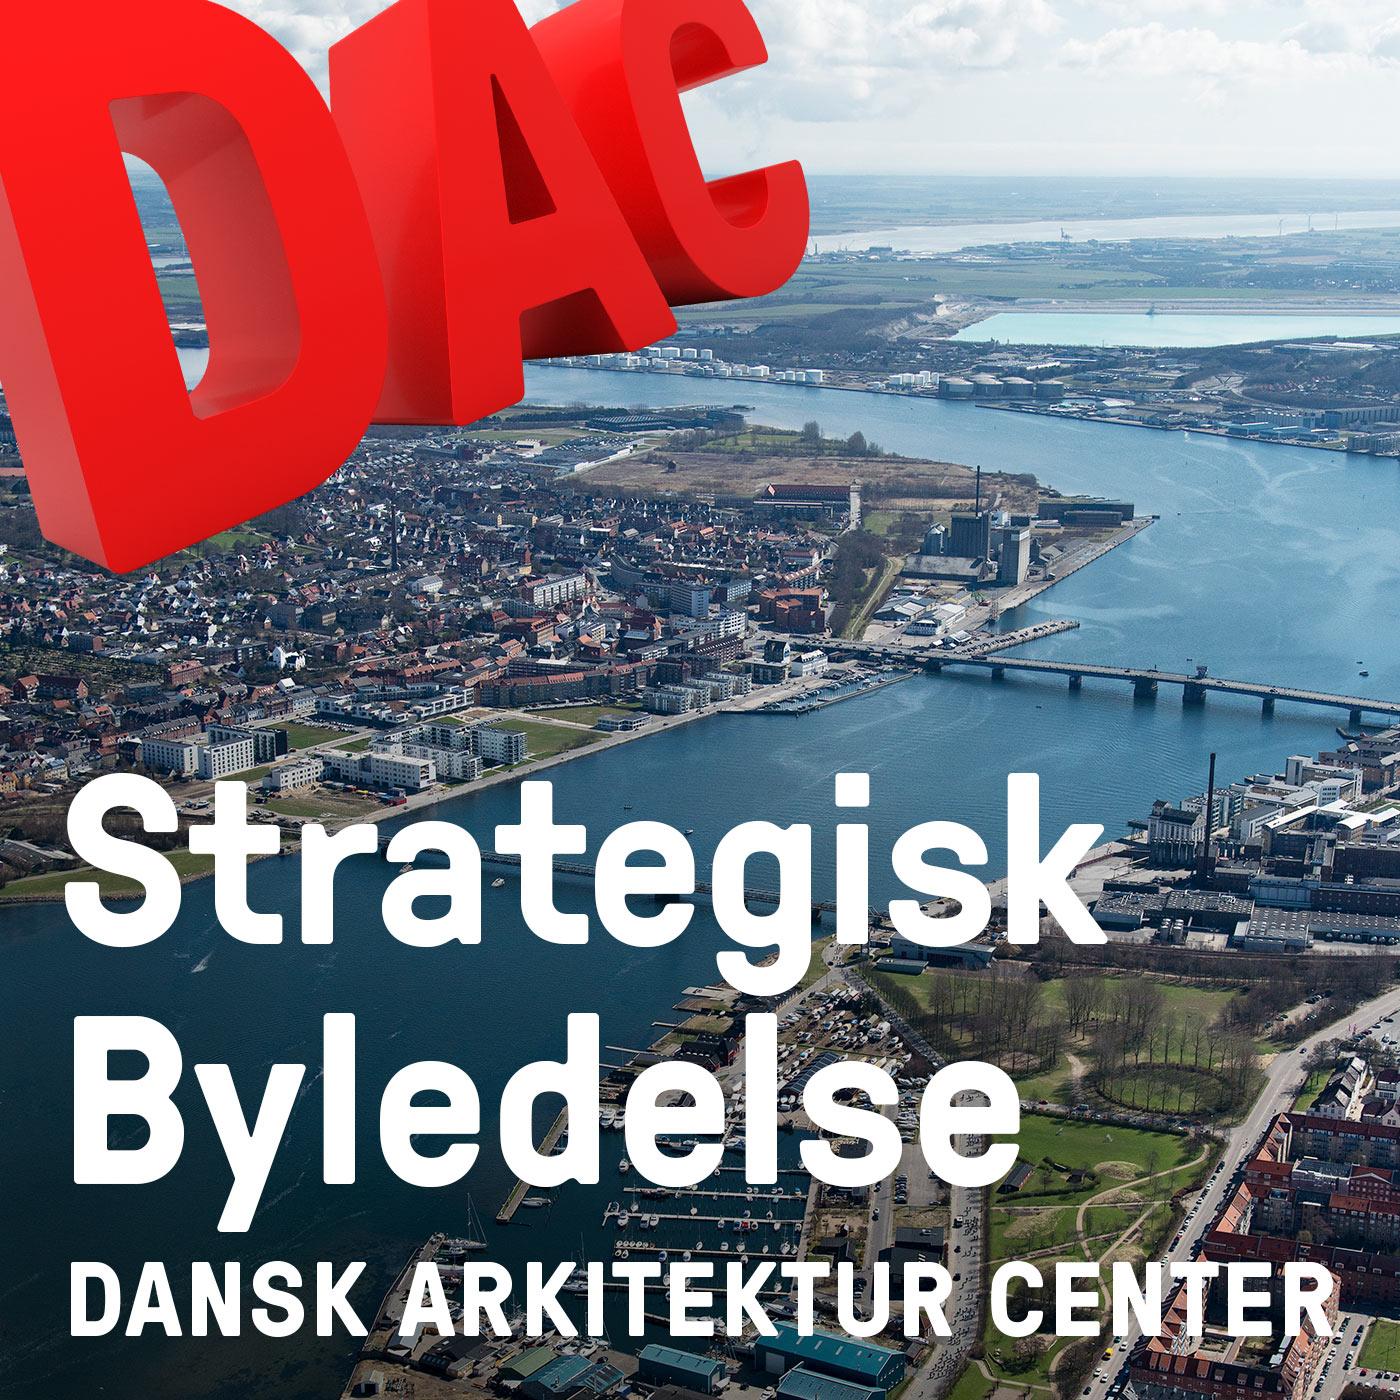 Strategisk Byledelse show art